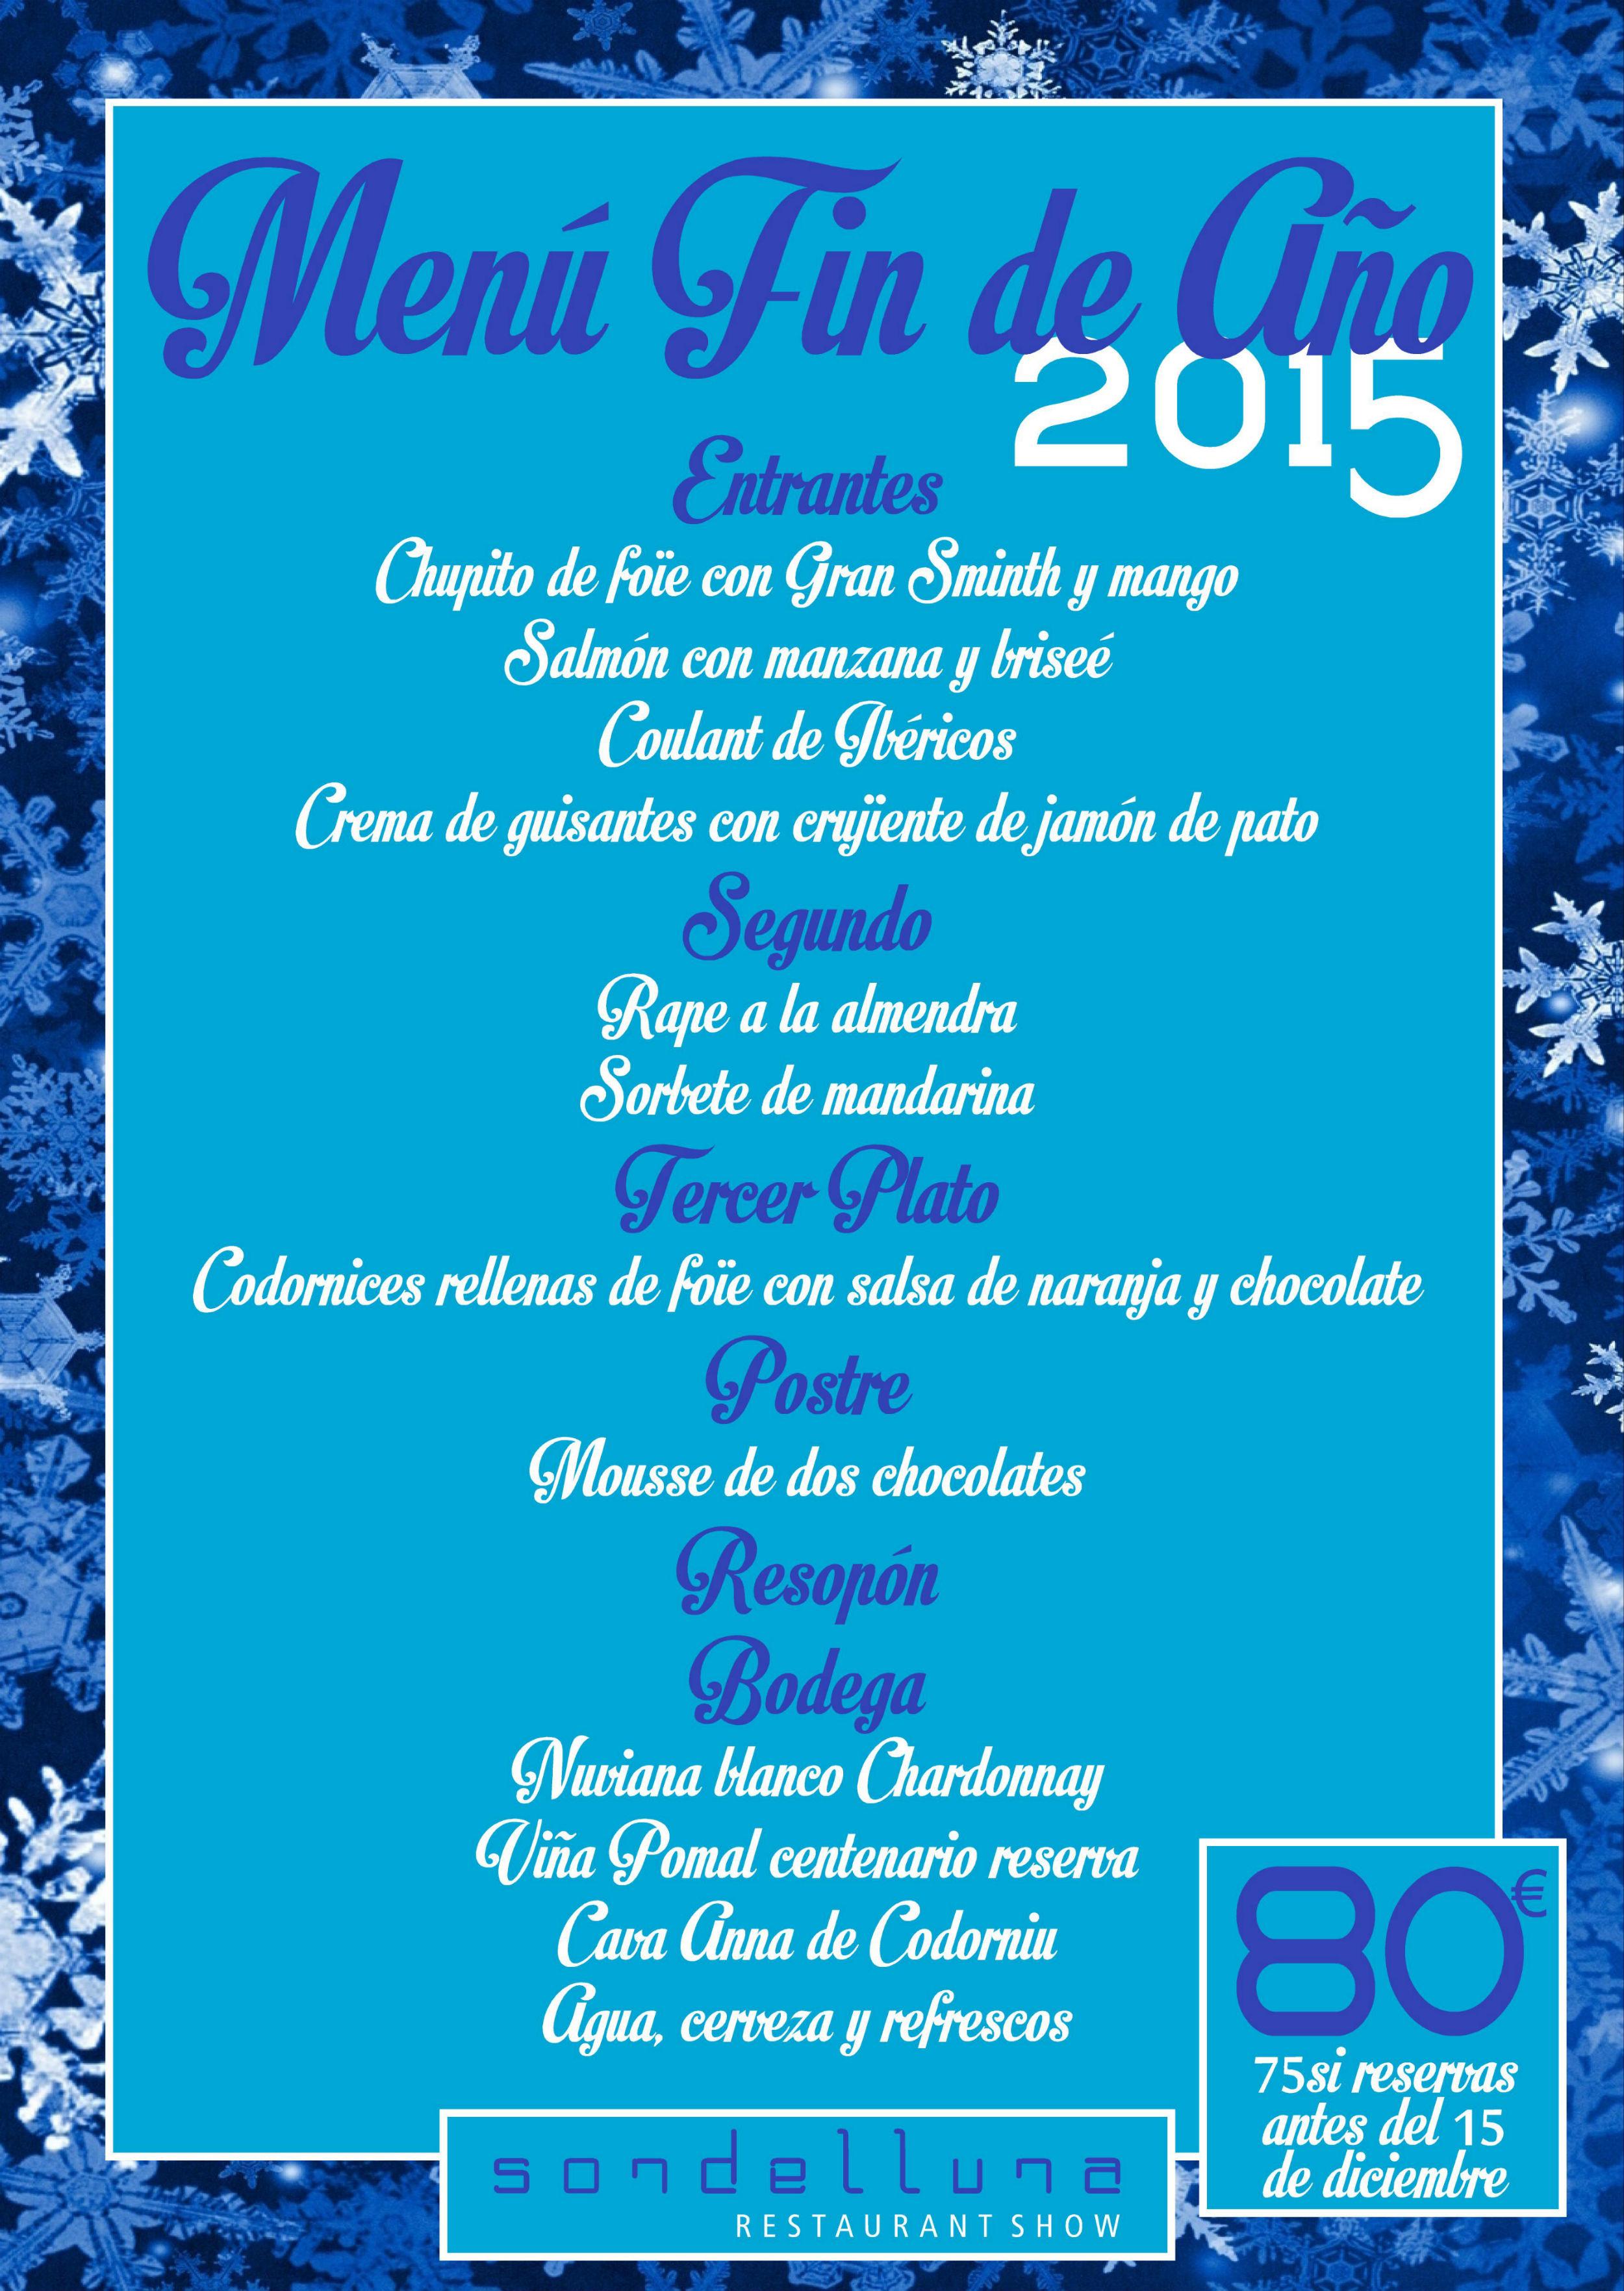 Men de fin de a o sondelluna restaurant show - Menus para fin de ano ...